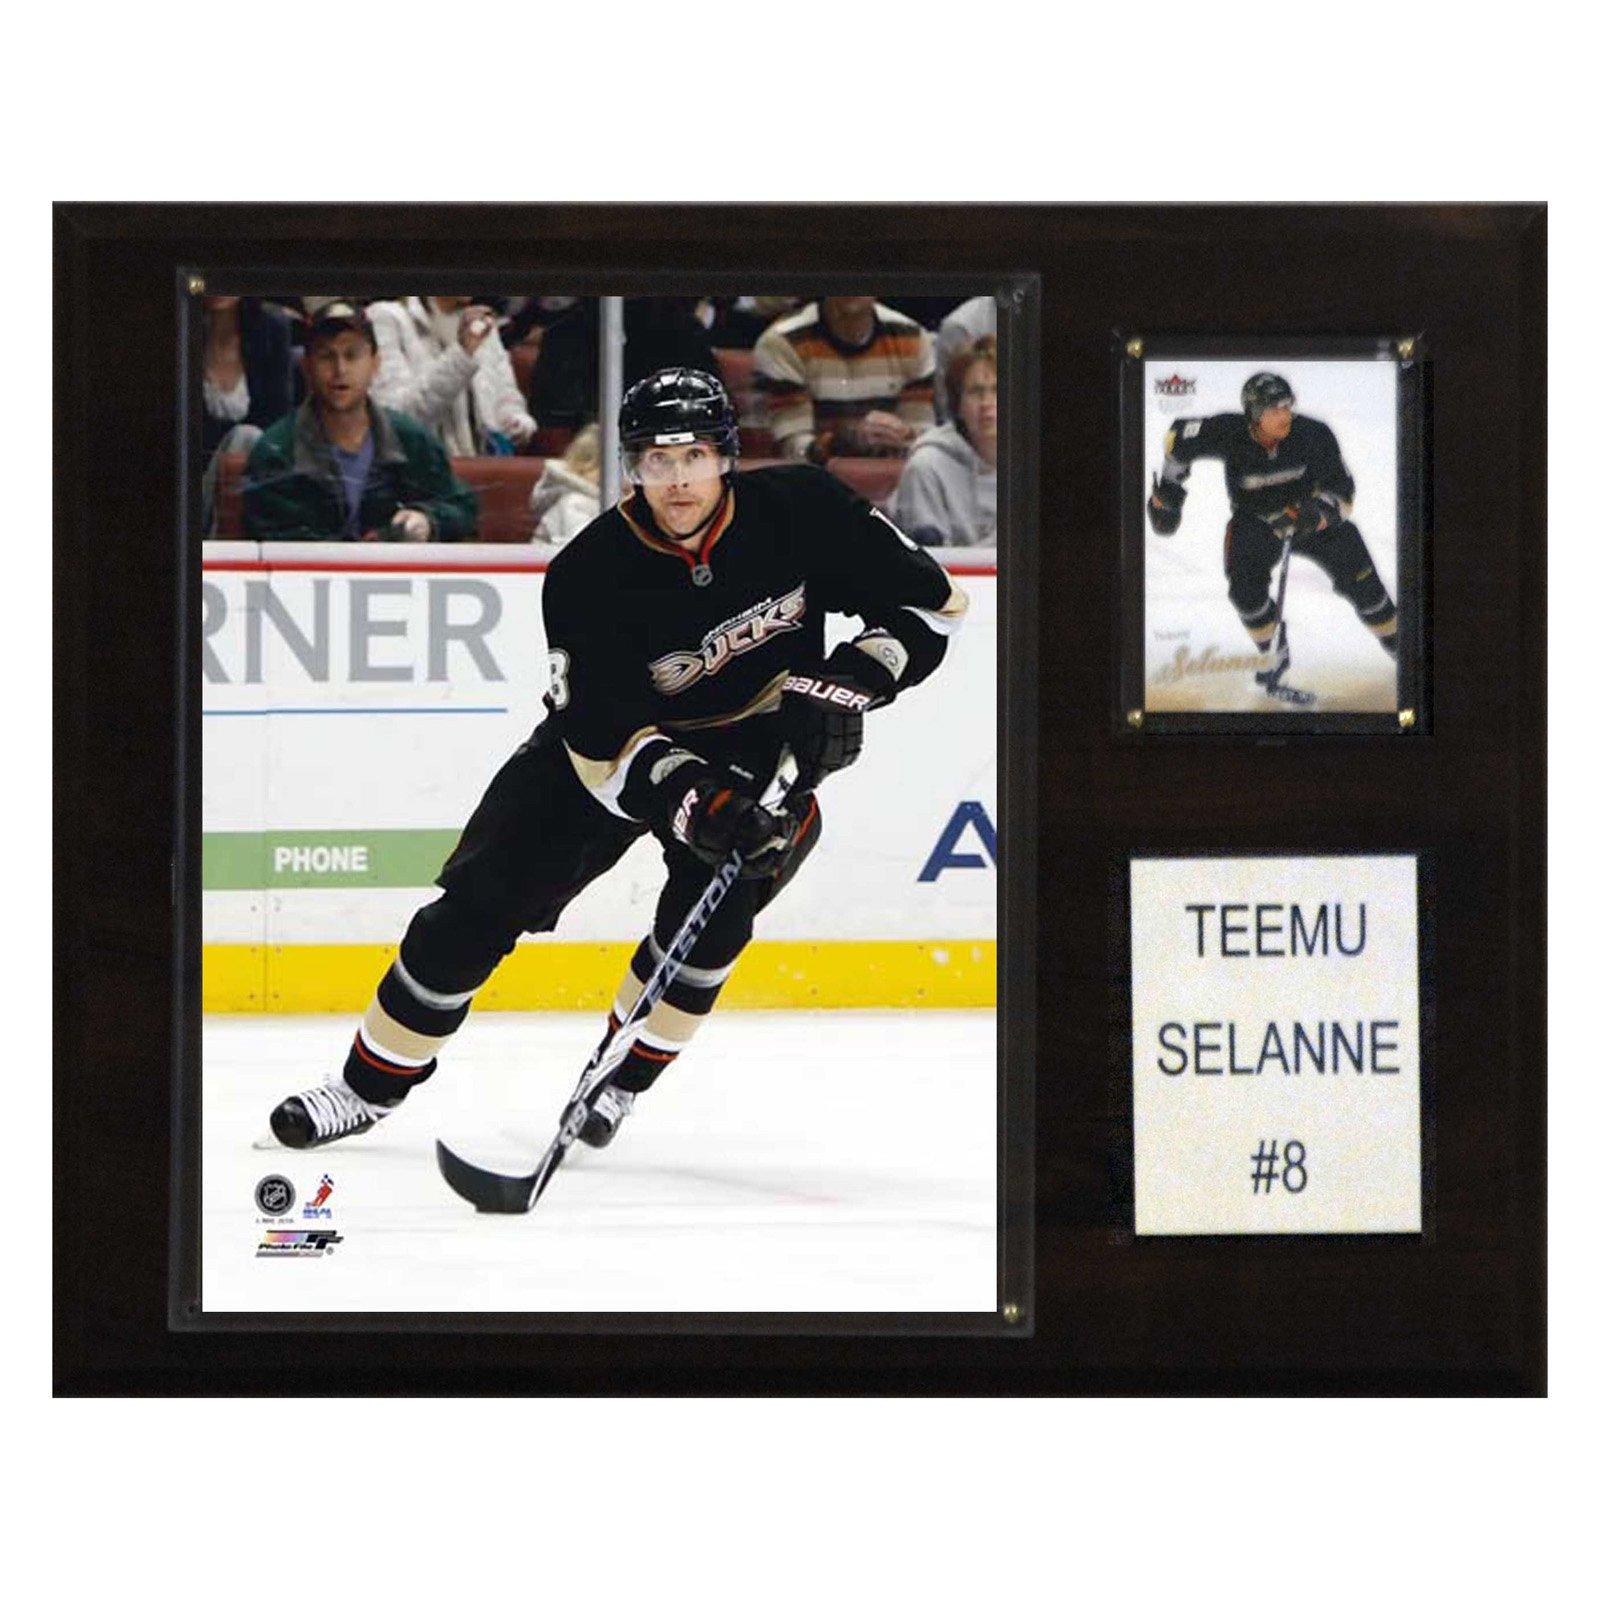 C&I Collectables NHL 12x15 Teemu Selanne Anaheim Ducks Player Plaque